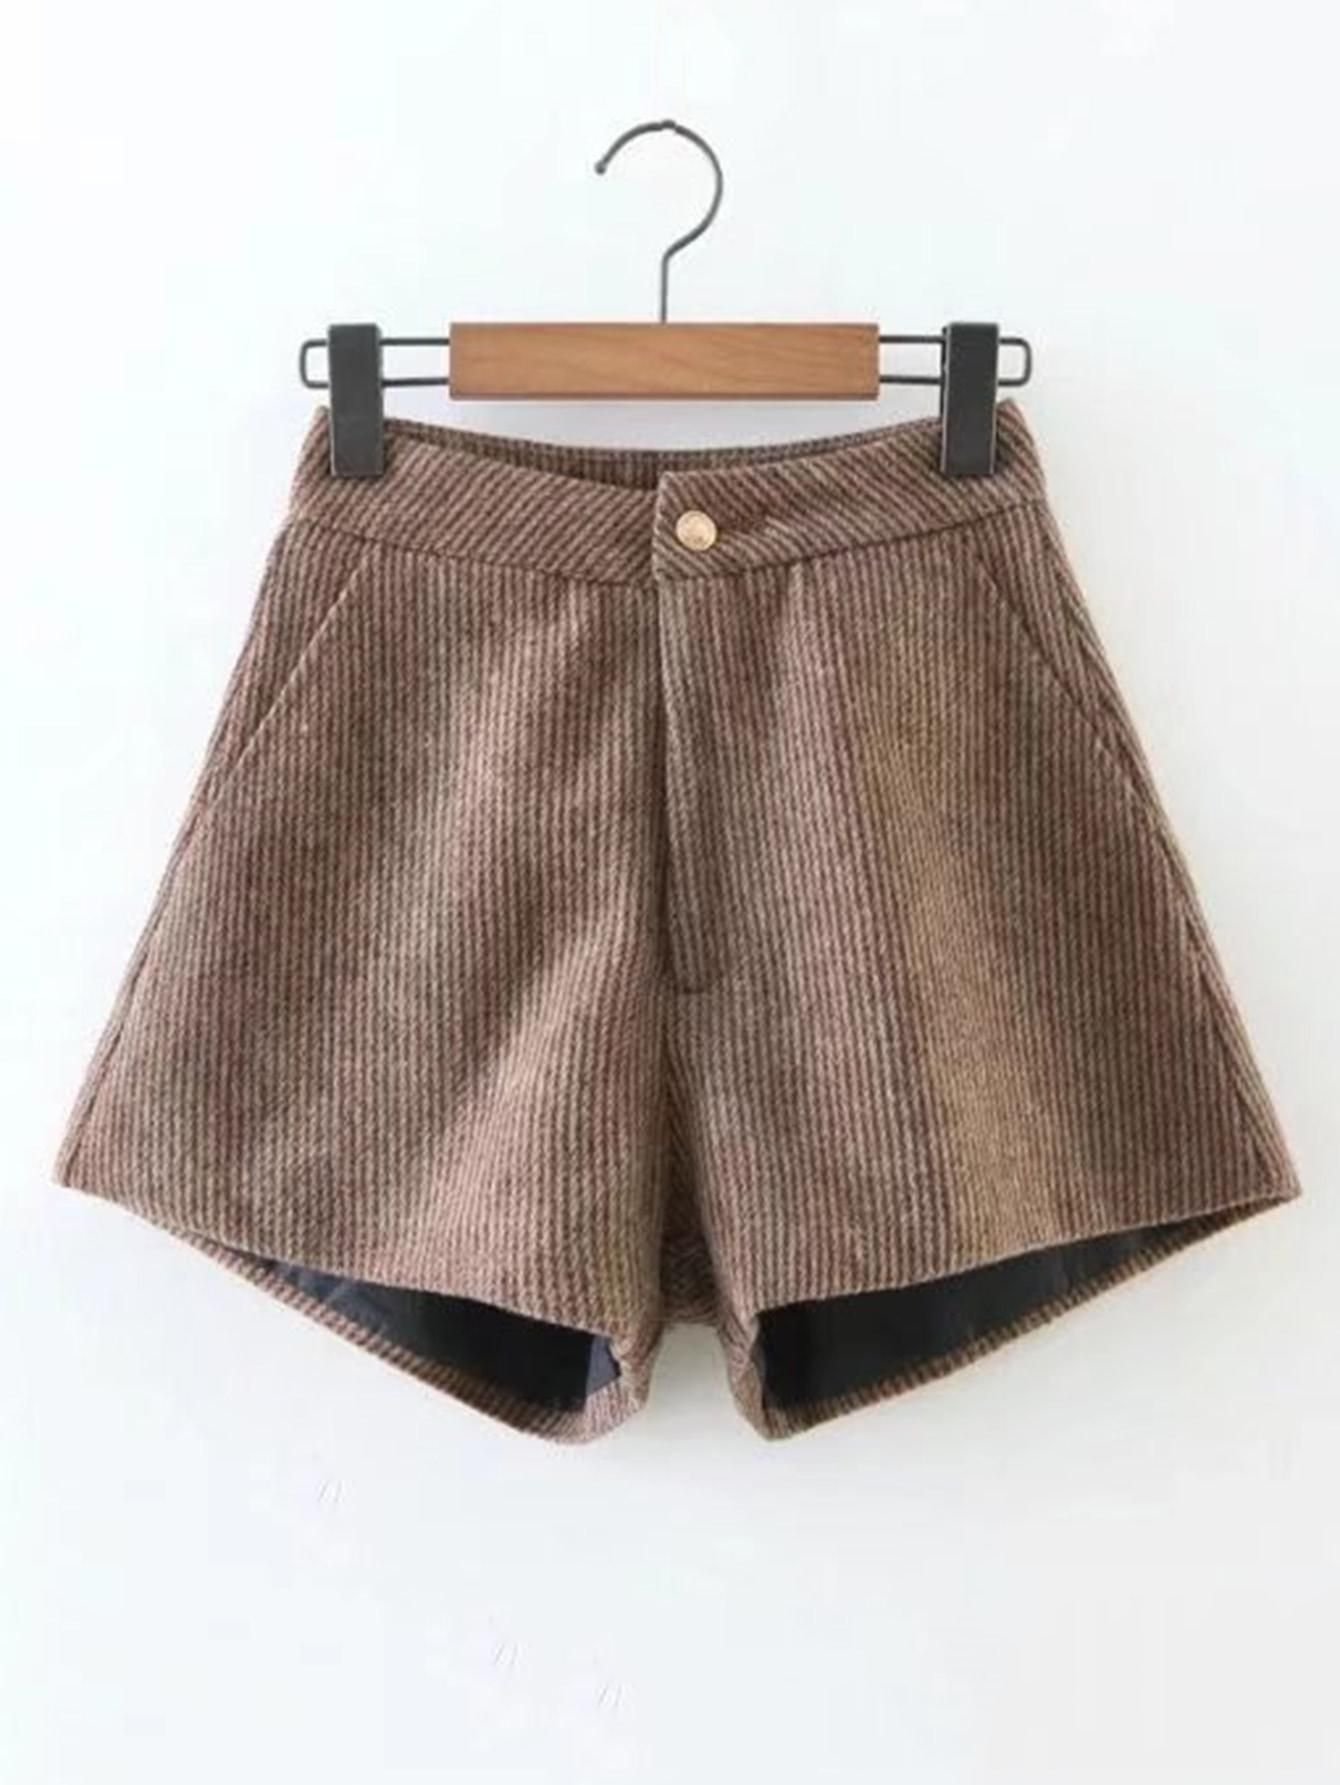 a2cafbe5a3 SheIn SheIn Contrast Fishnet Raw Hem Denim Skirt AdoreWe